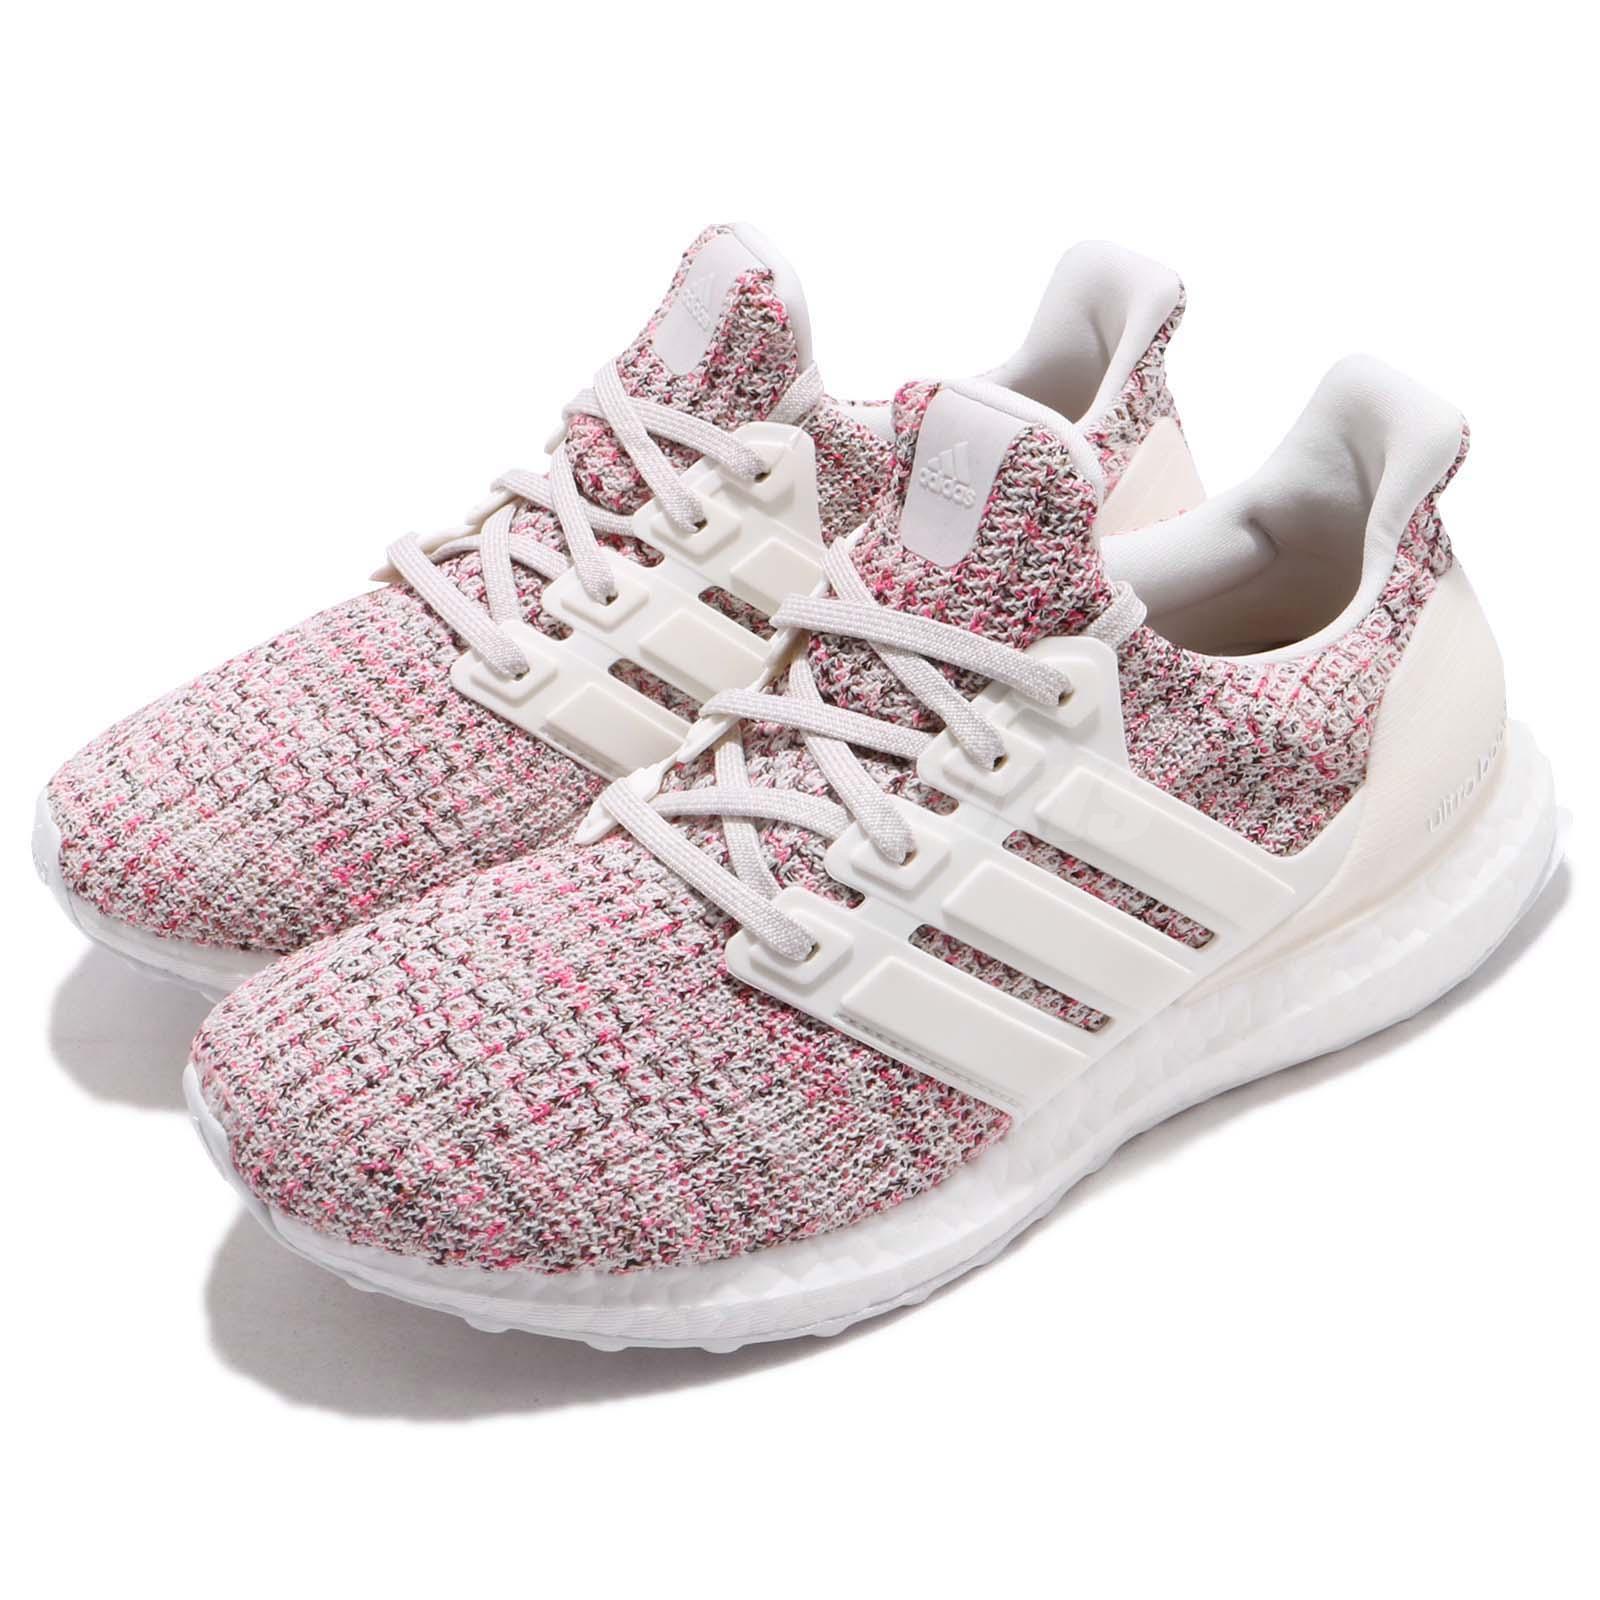 adidas Ultra Boost 4.0 Pink Static (W)